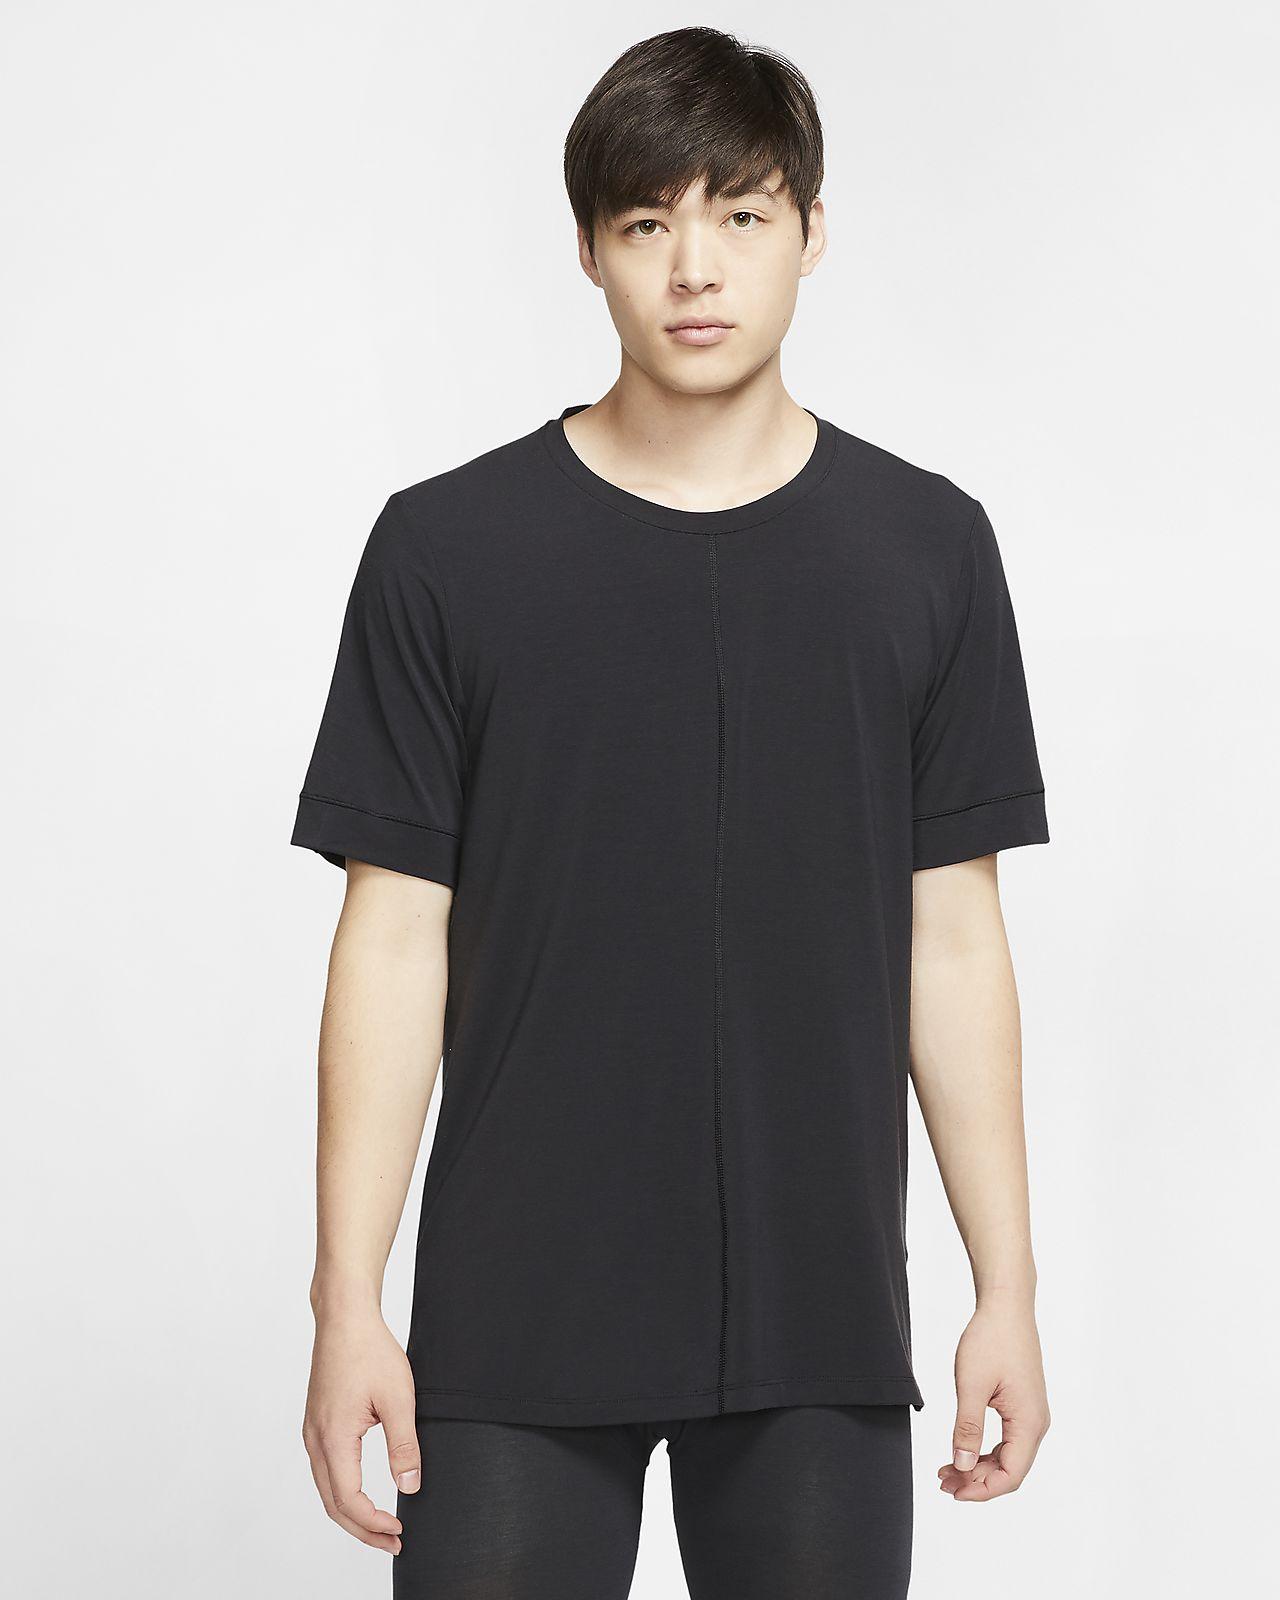 Męska koszulka z krótkim rękawem Nike Yoga Dri-FIT